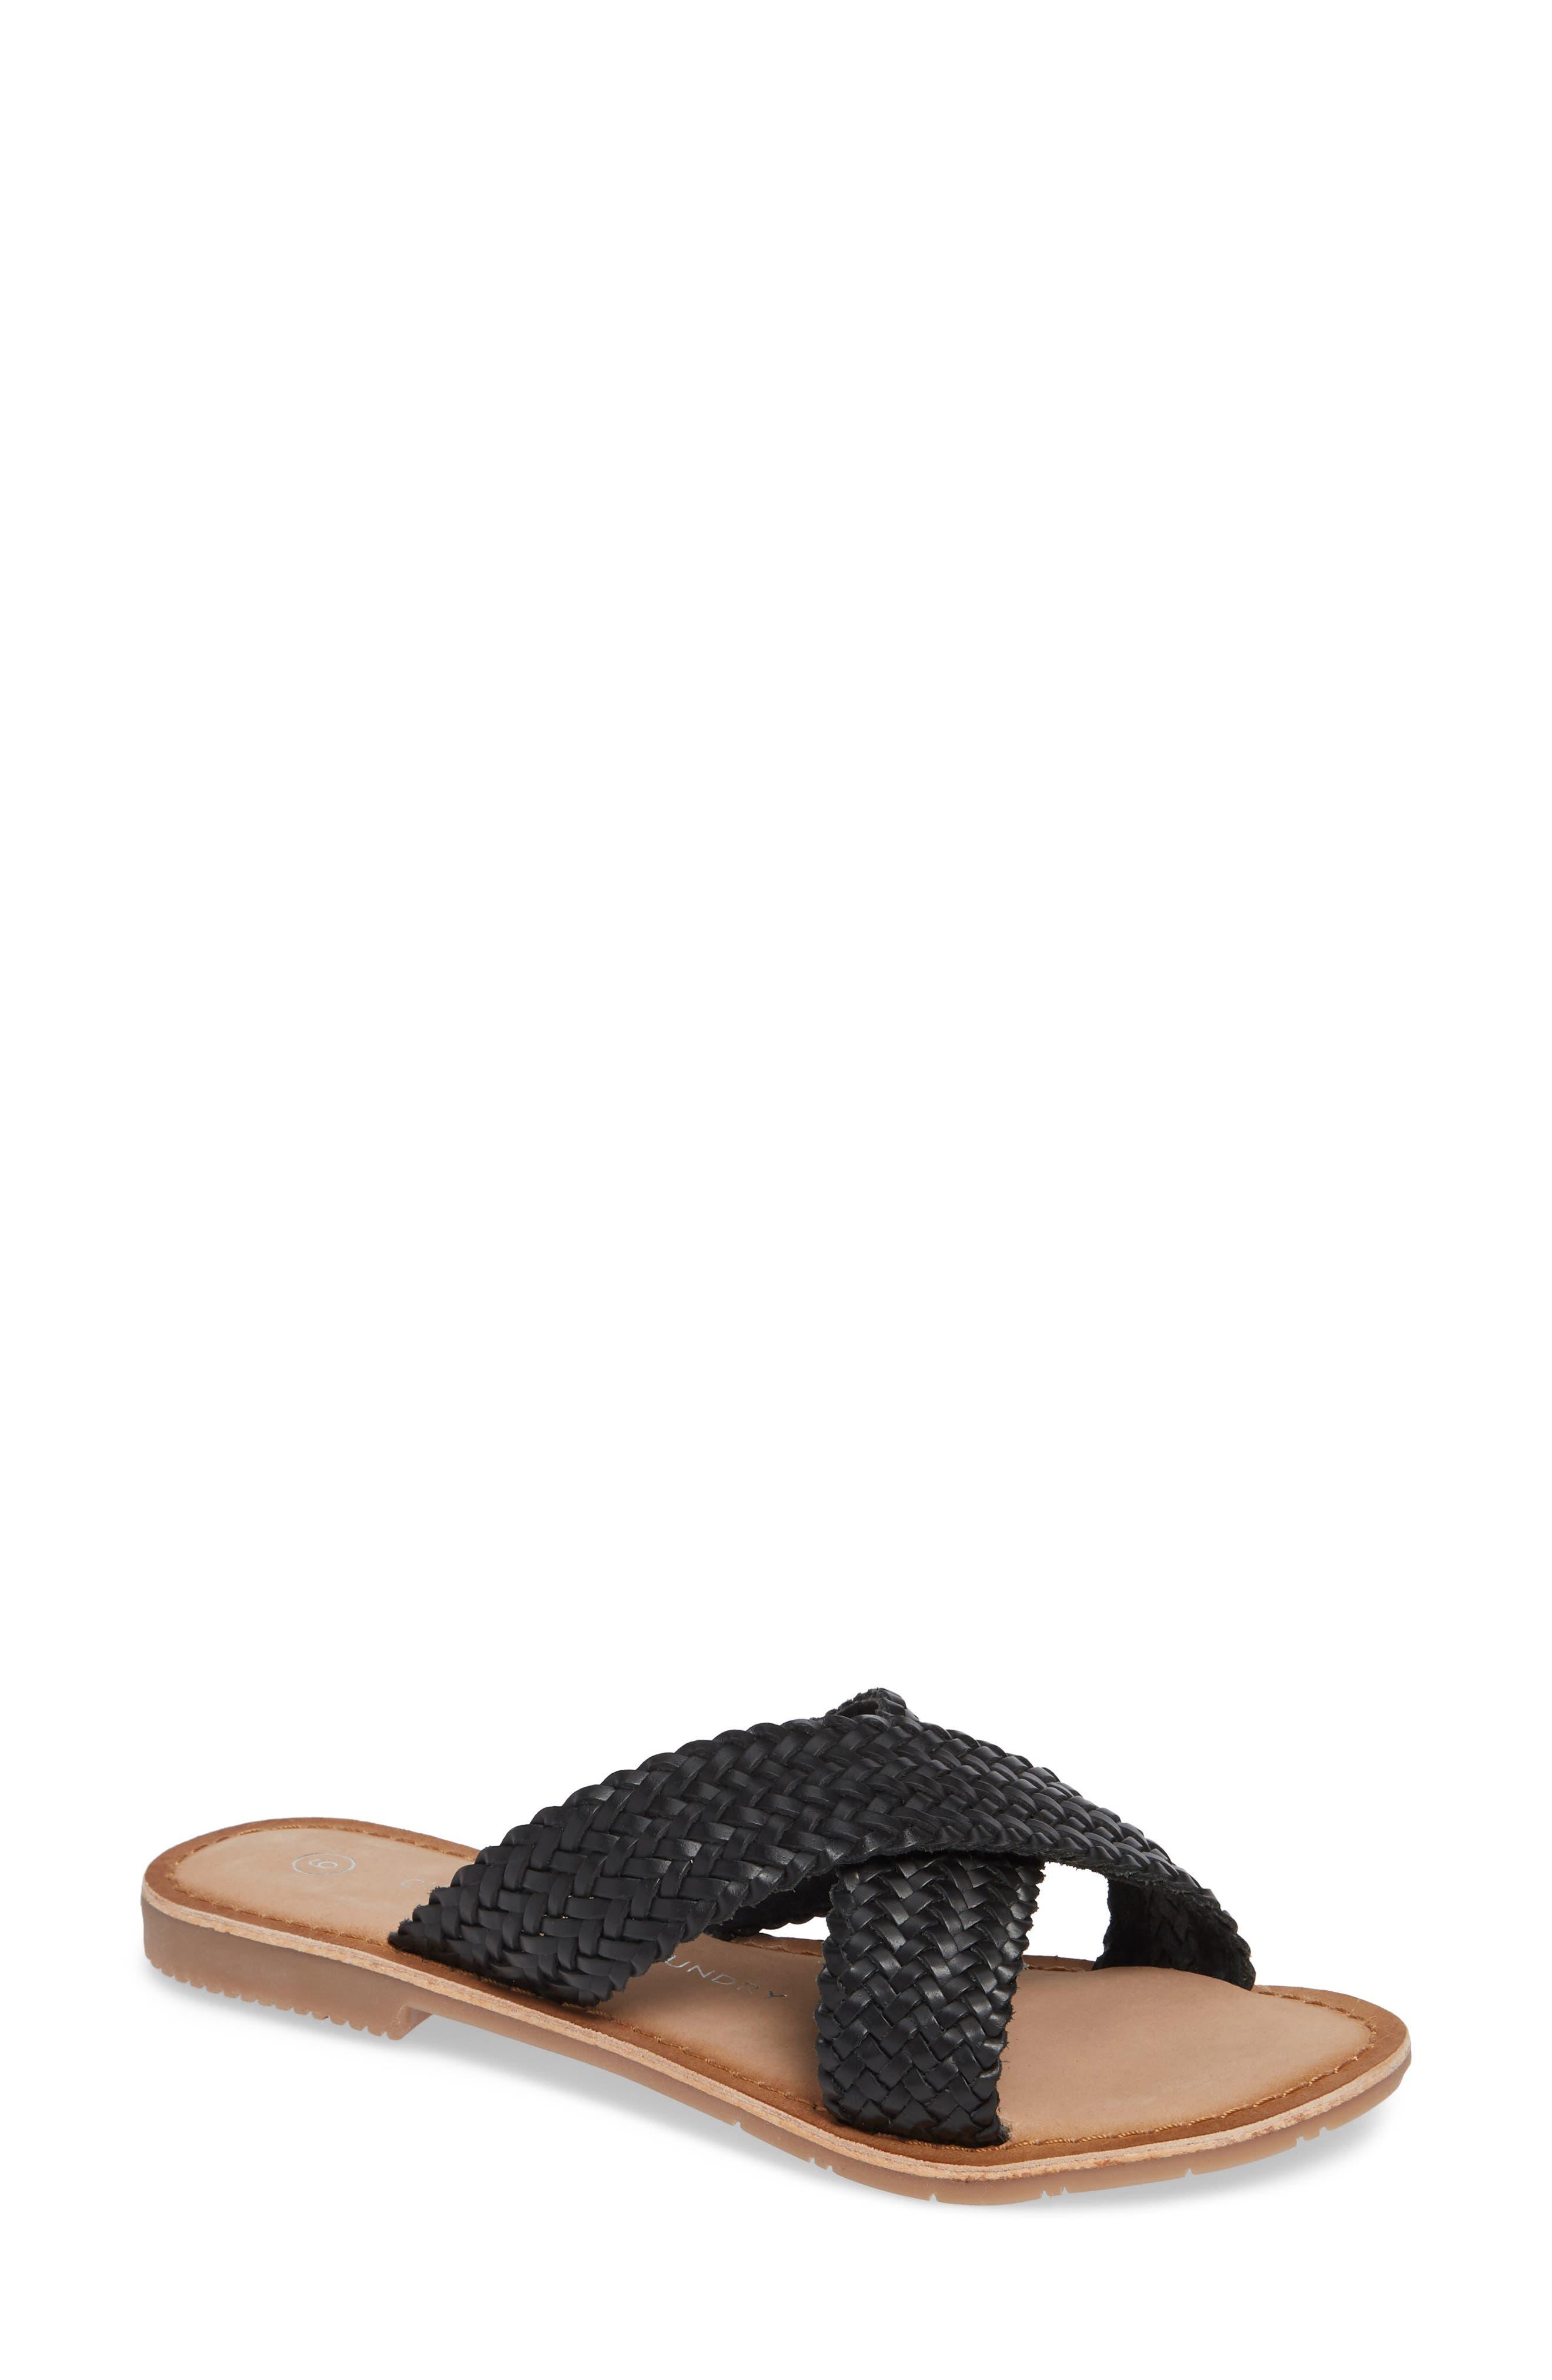 Pure Woven Slide Sandal,                         Main,                         color, BLACK LEATHER